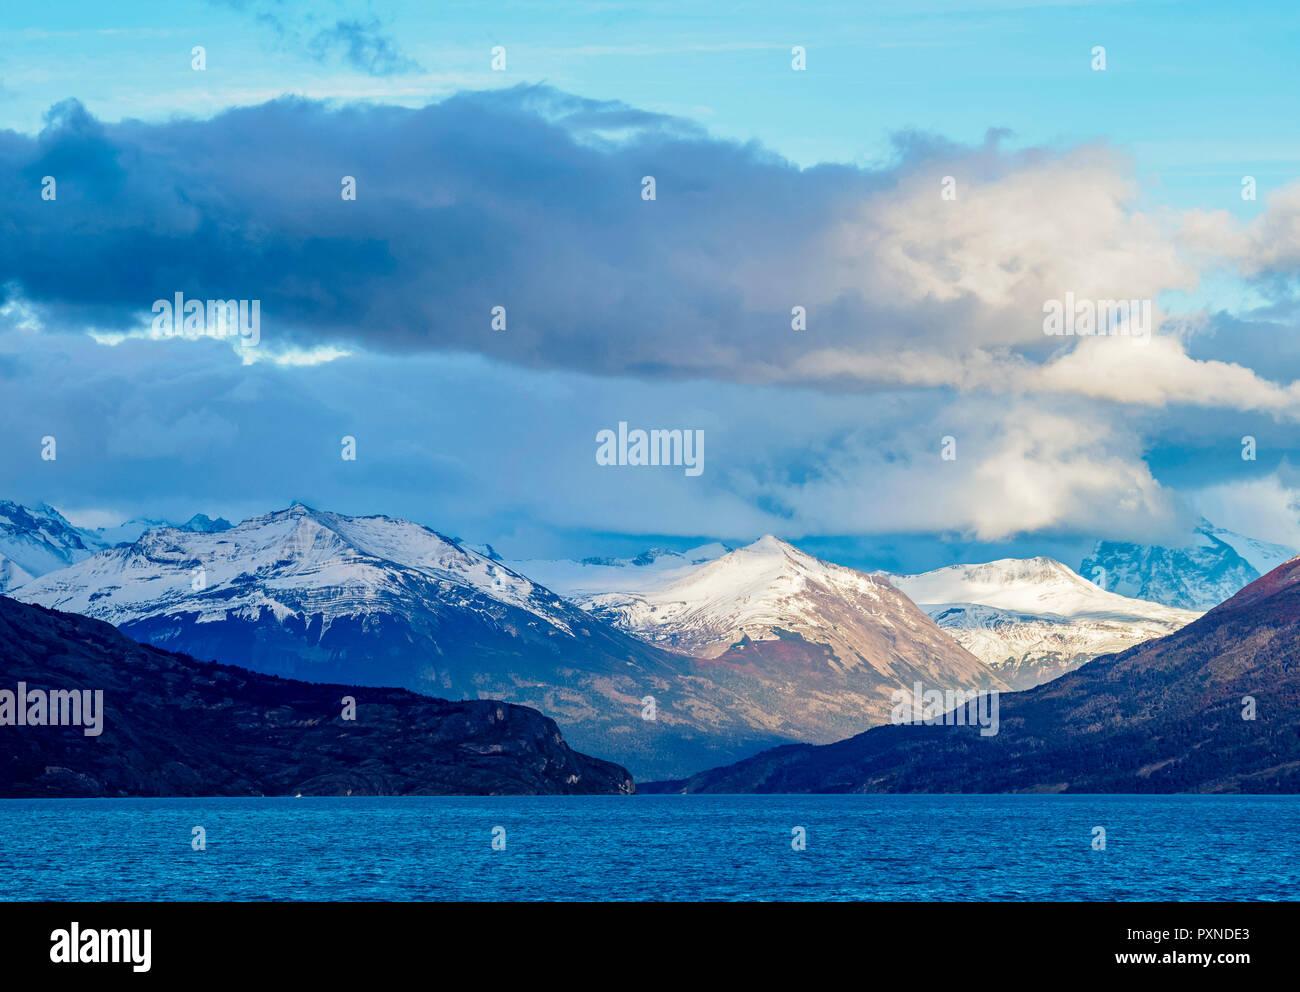 Lake Argentino, Los Glaciares National Park, Santa Cruz Province, Patagonia, Argentina - Stock Image